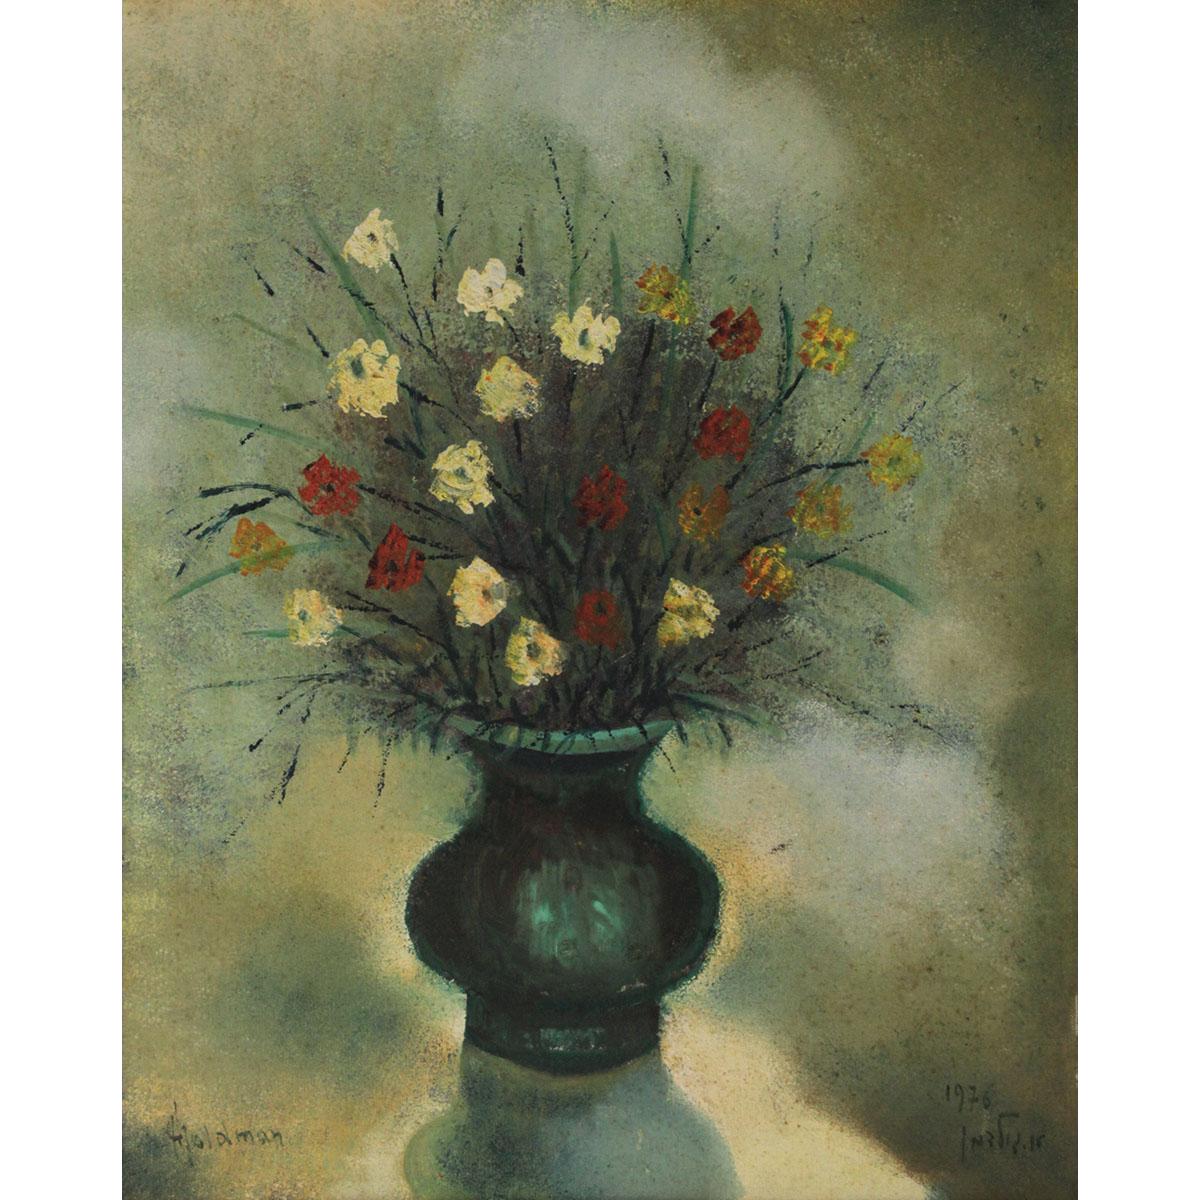 Albert Goldman (Israel, 1922-2011) - Flower Vase Painting, Oil on Canvas Mounted on Board, 1976.